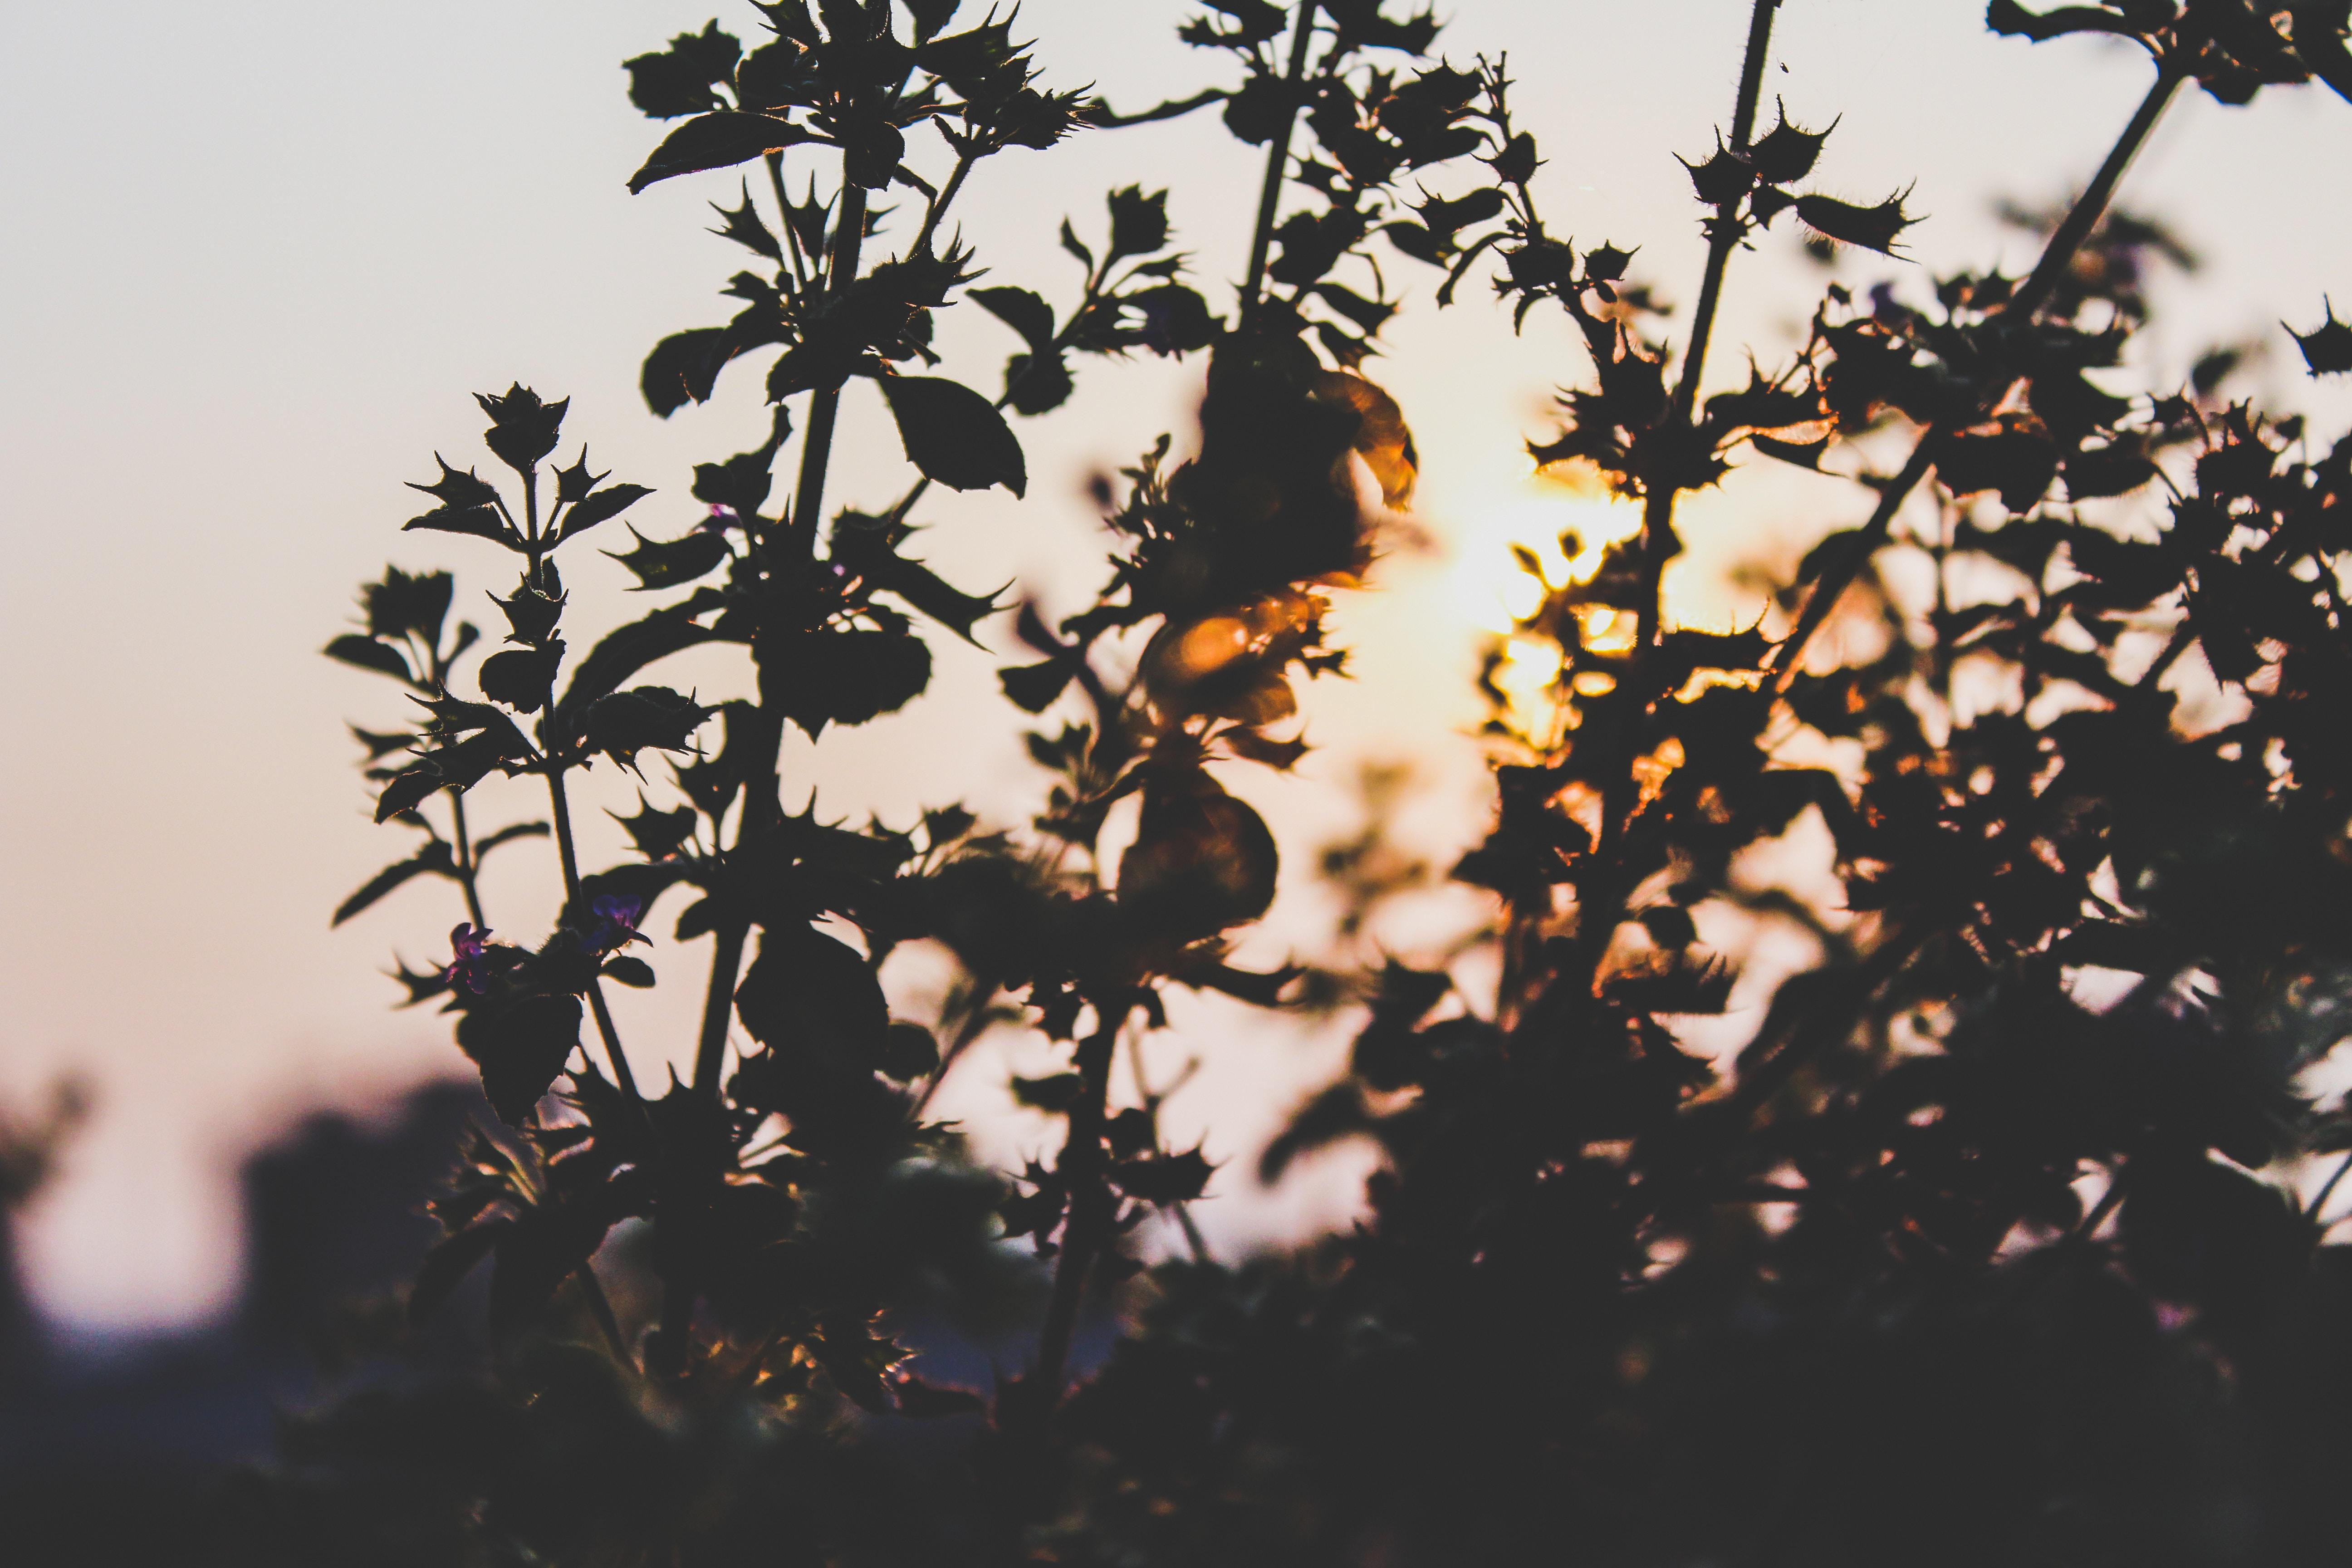 plants under calm sky